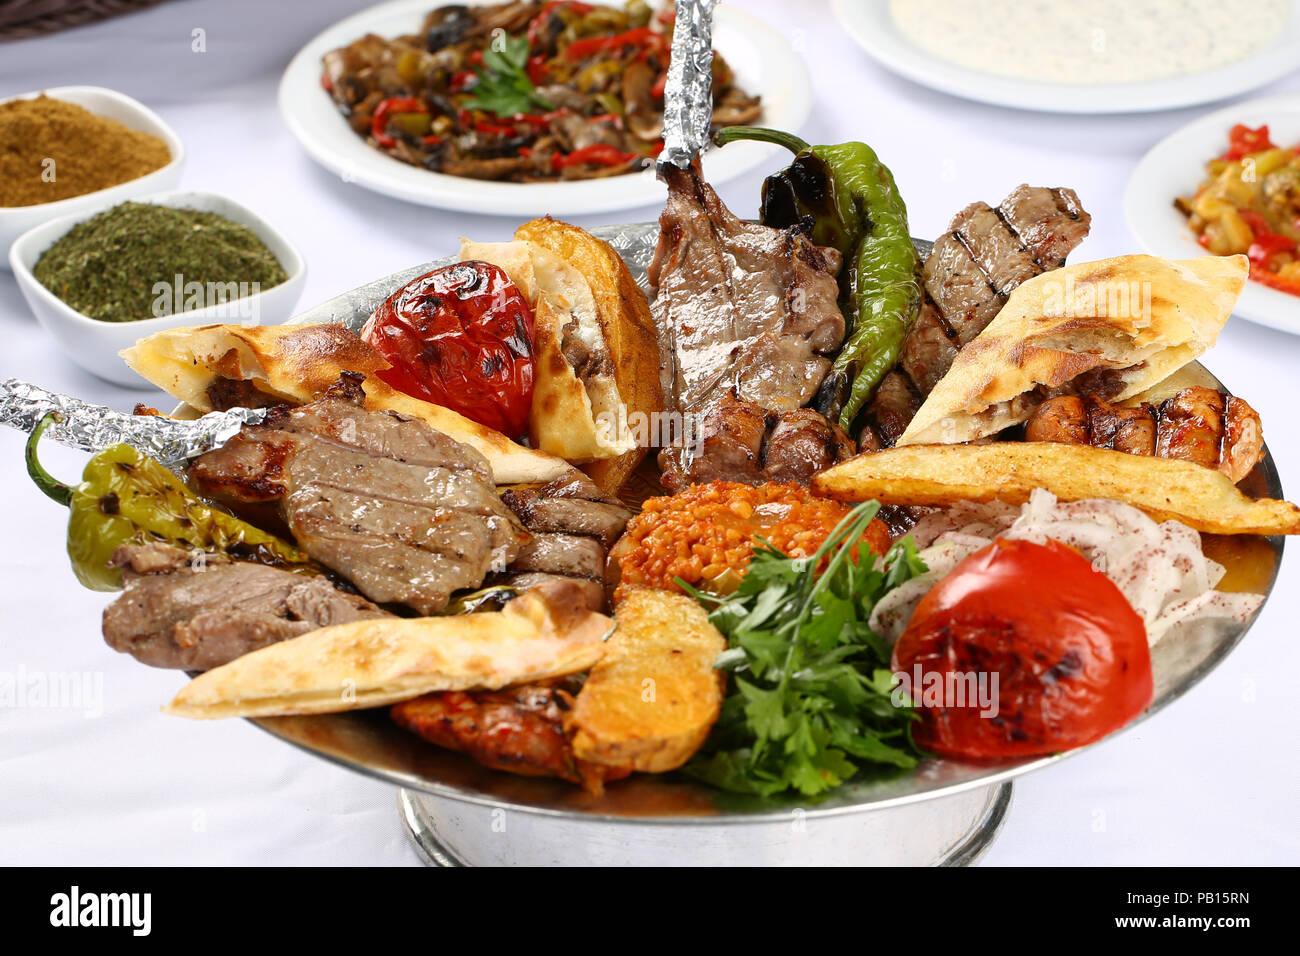 Mixed Kebab Plate Turkish Lahmacun Adana Shish Kebab Chicken Meat Meatball Stock Photo Alamy